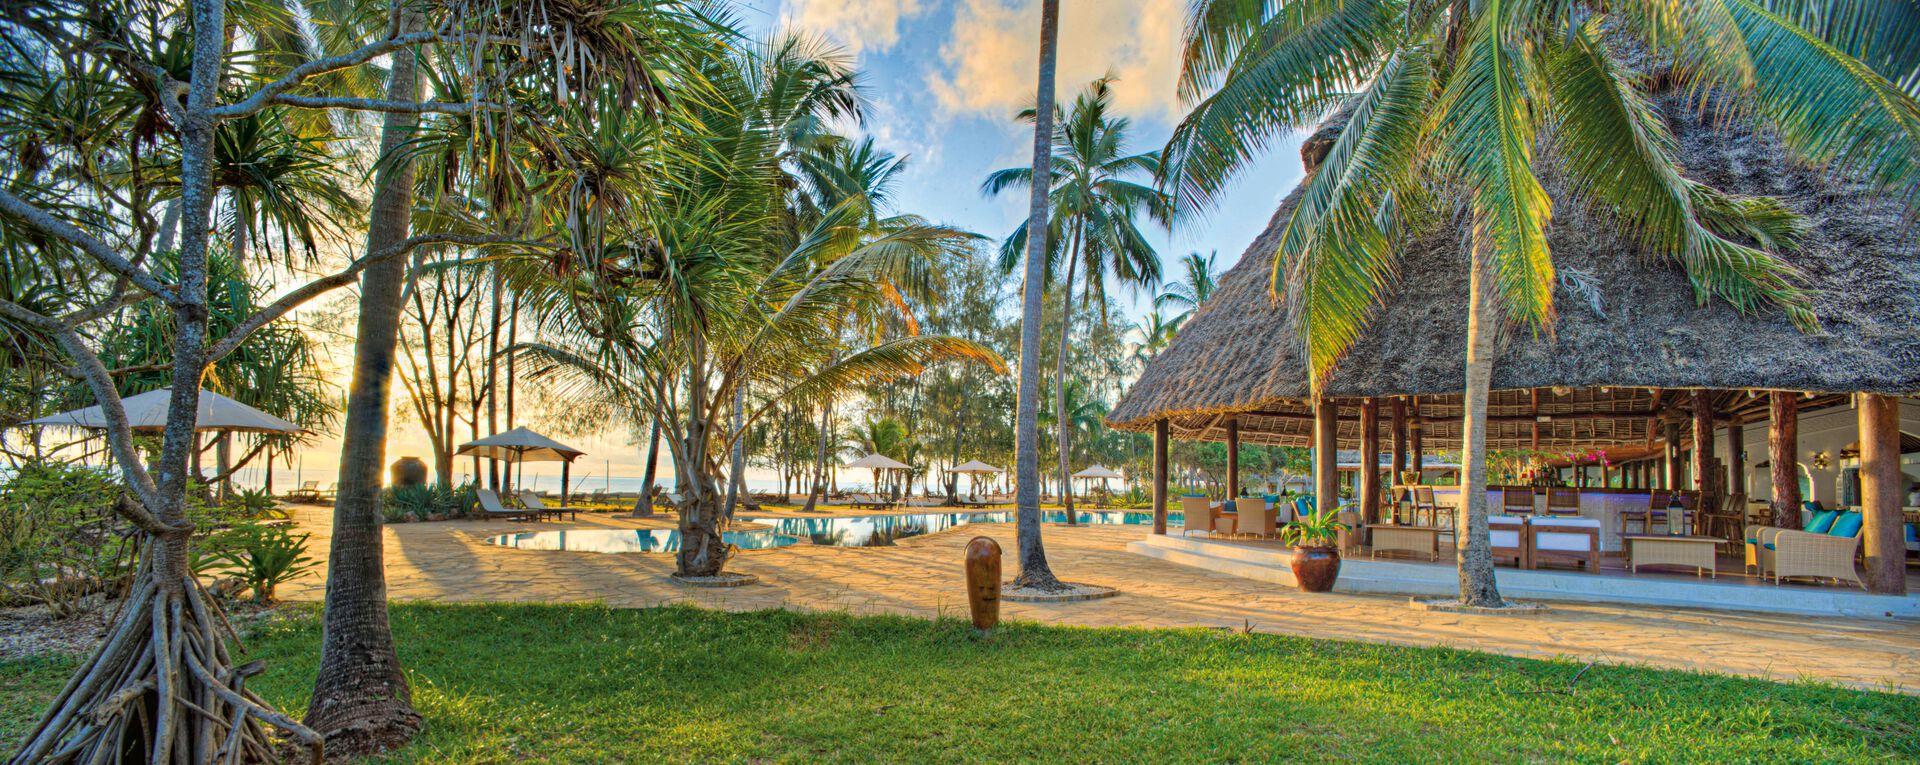 Bluebay Beach Resort & Spa - 4*